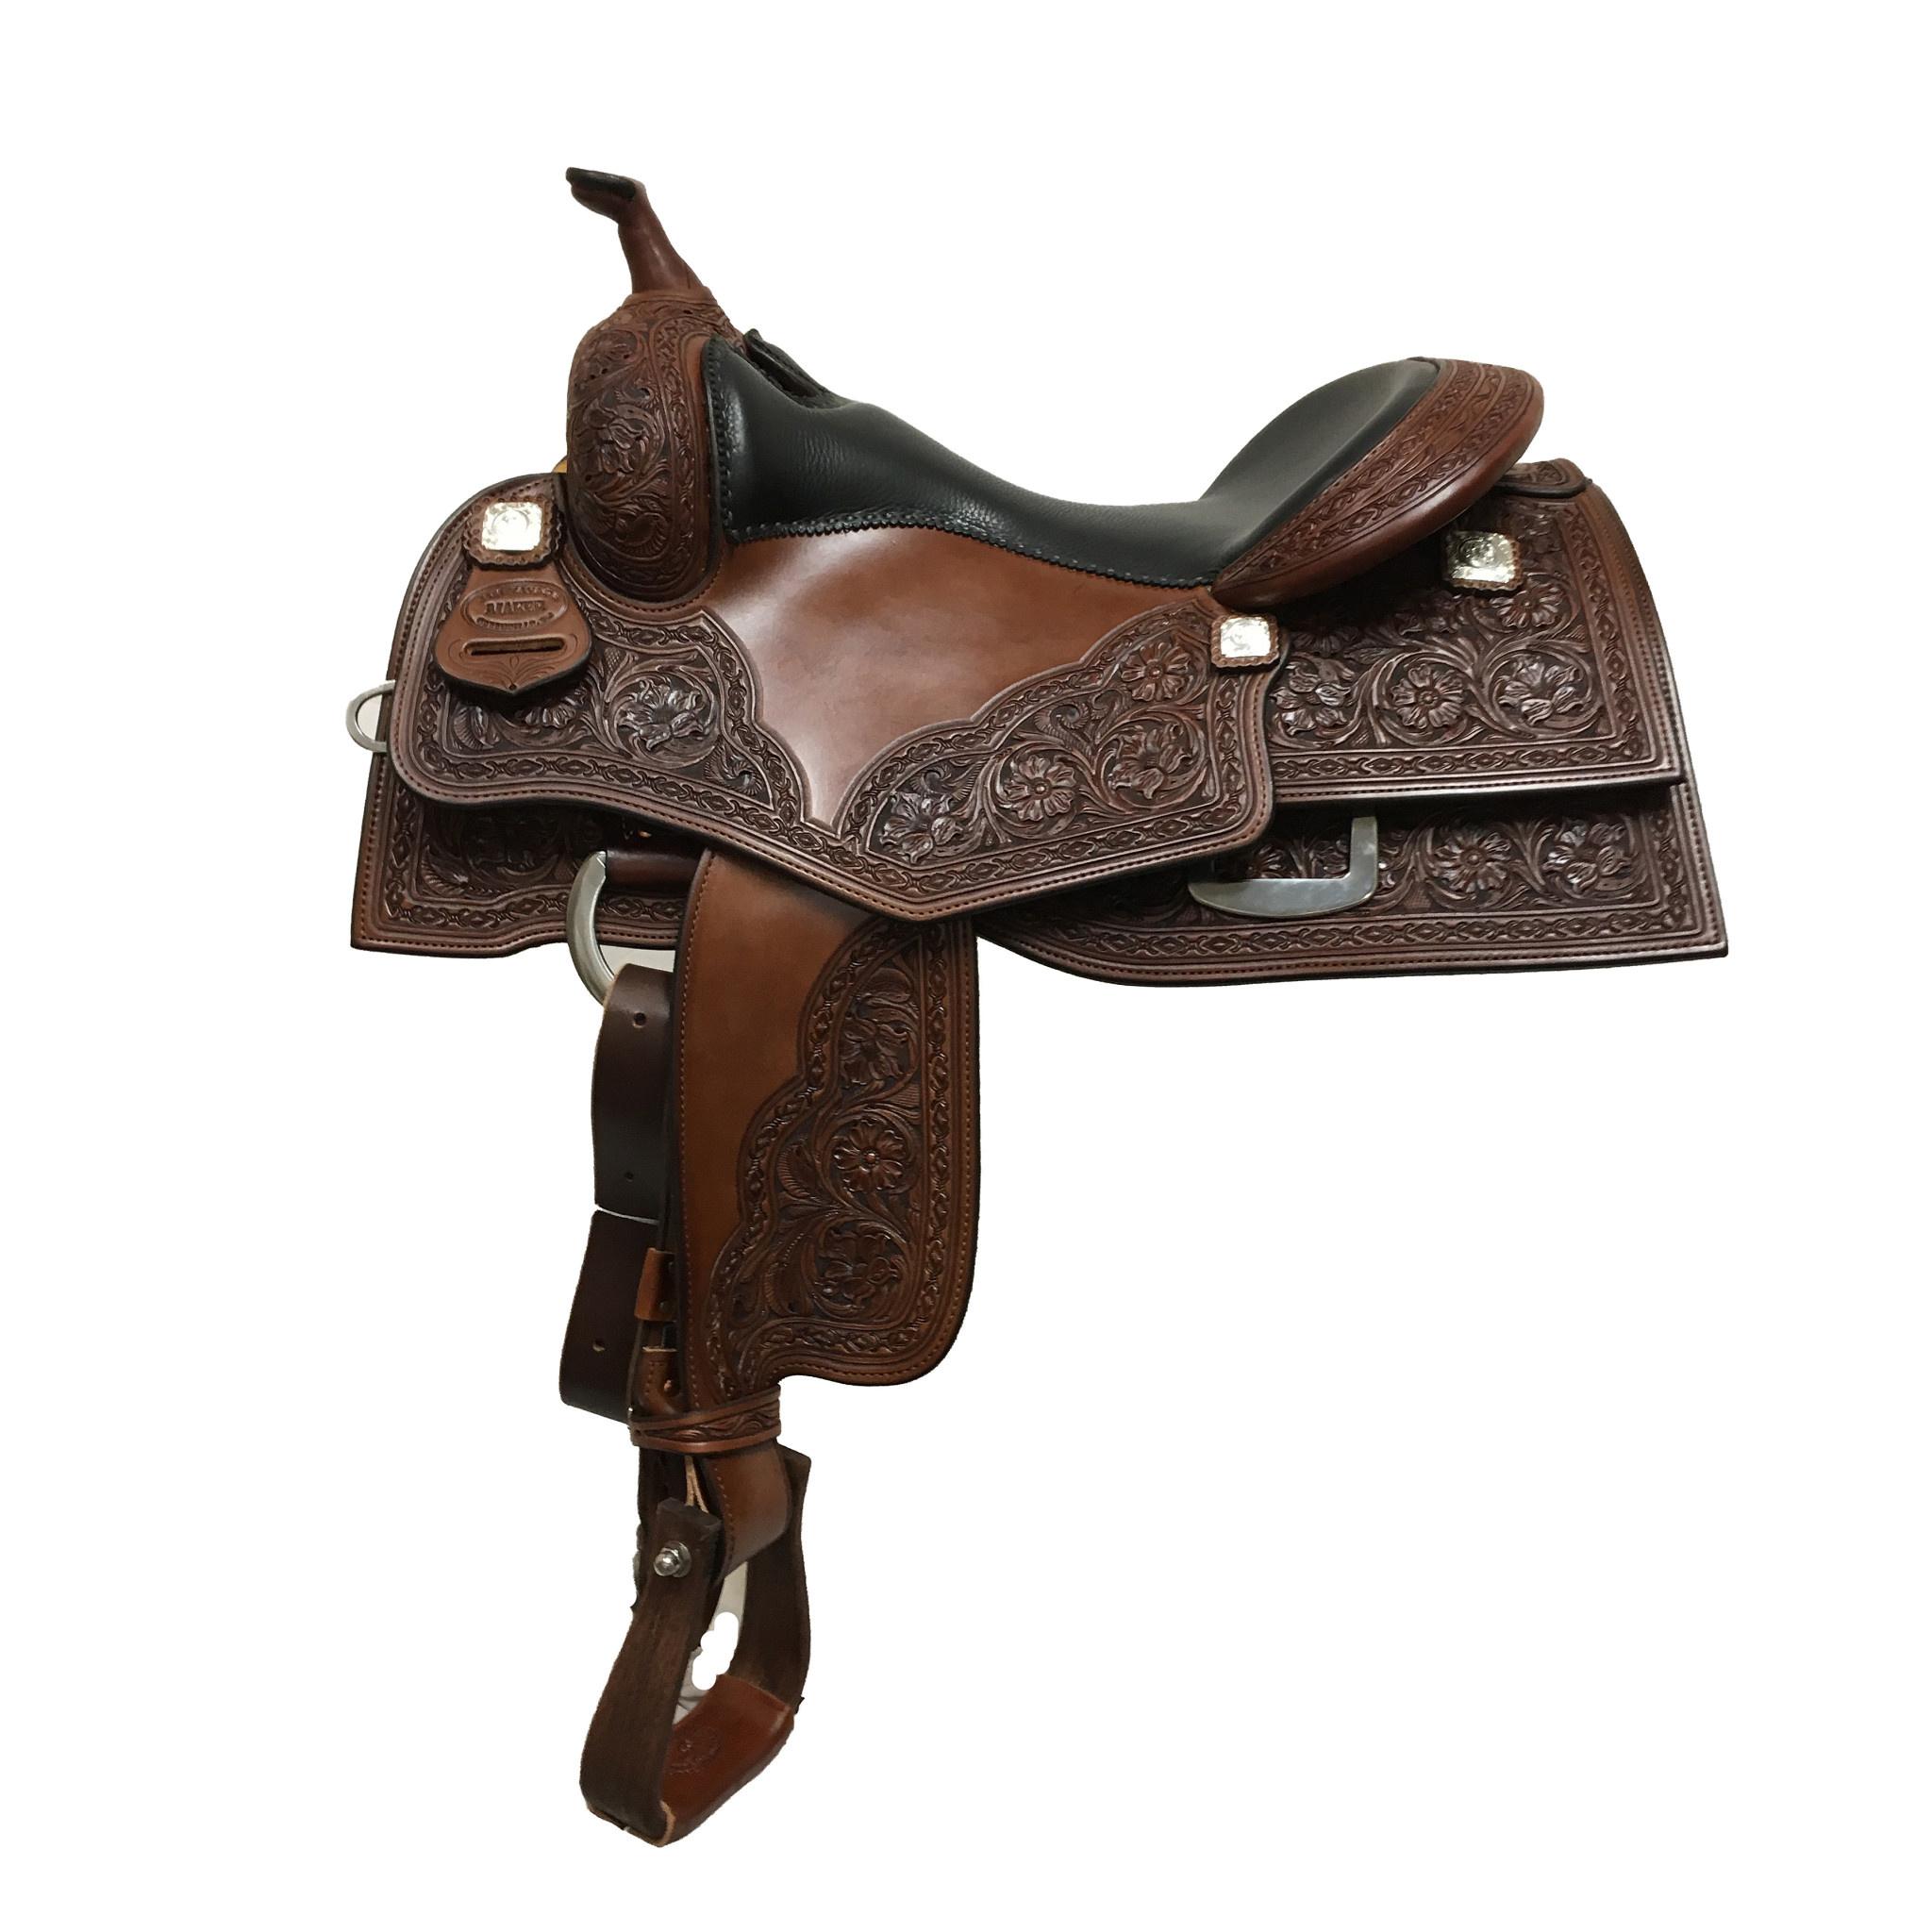 Jim Taylor Custom saddle Jim Taylor Stock Saddles 4